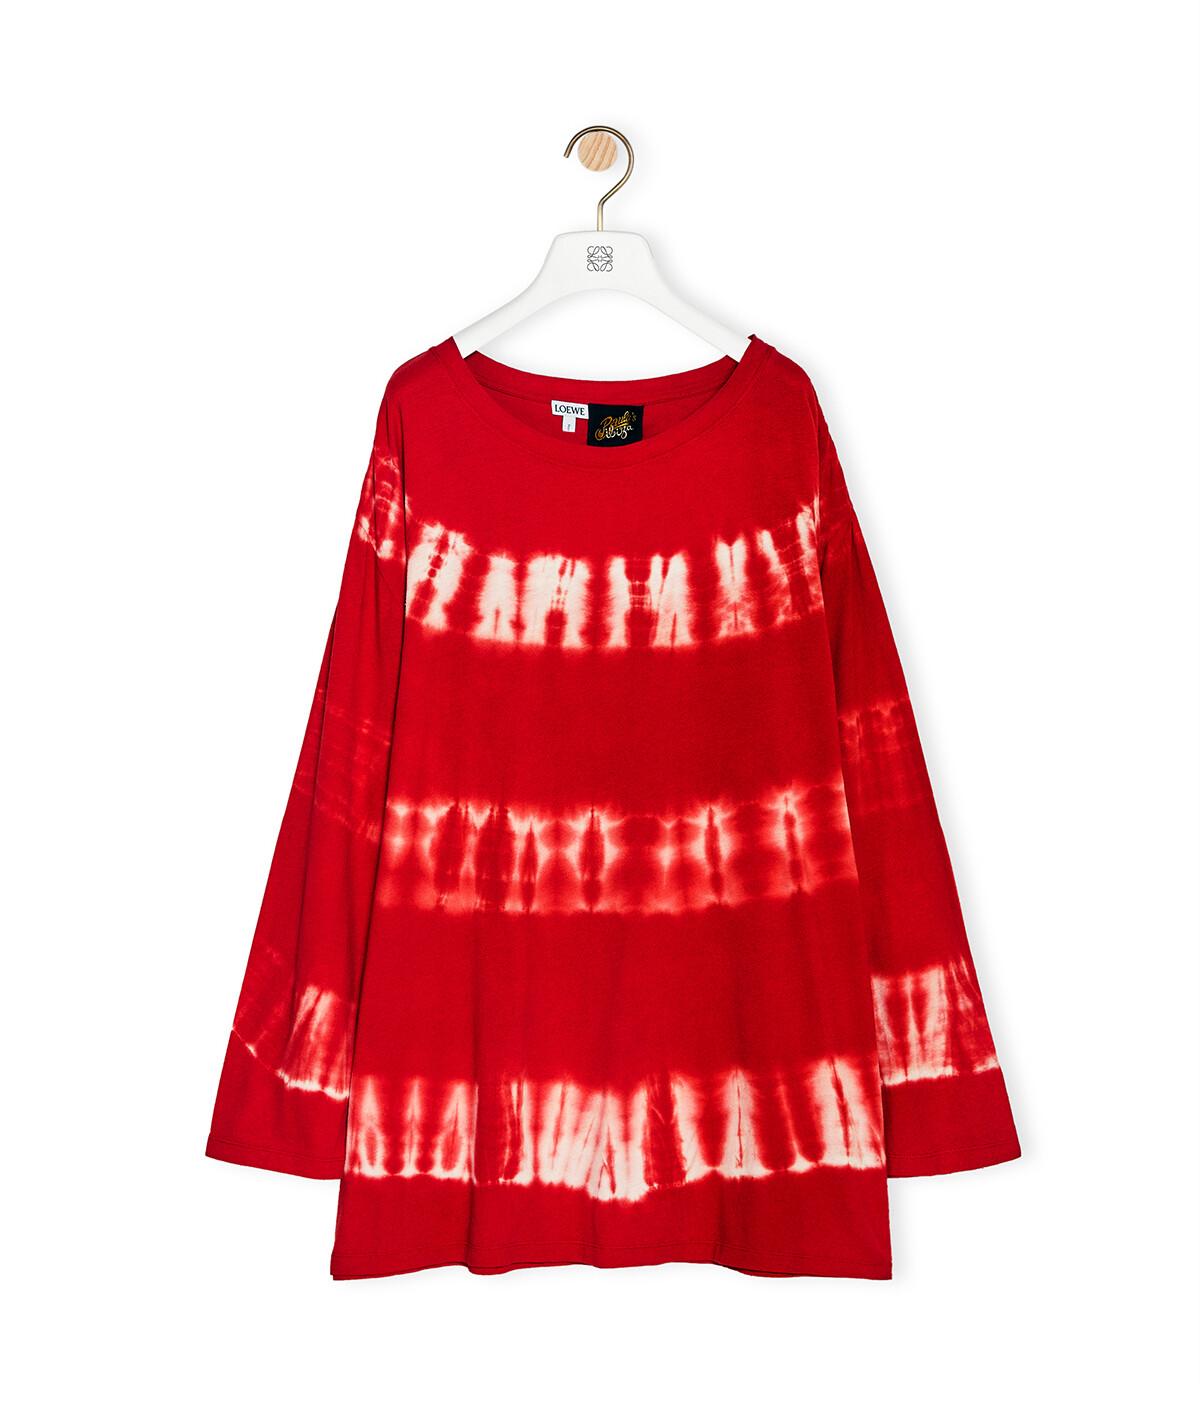 LOEWE Camisa De Algodón Y Seda Tie Dye Rojo/Blanco front